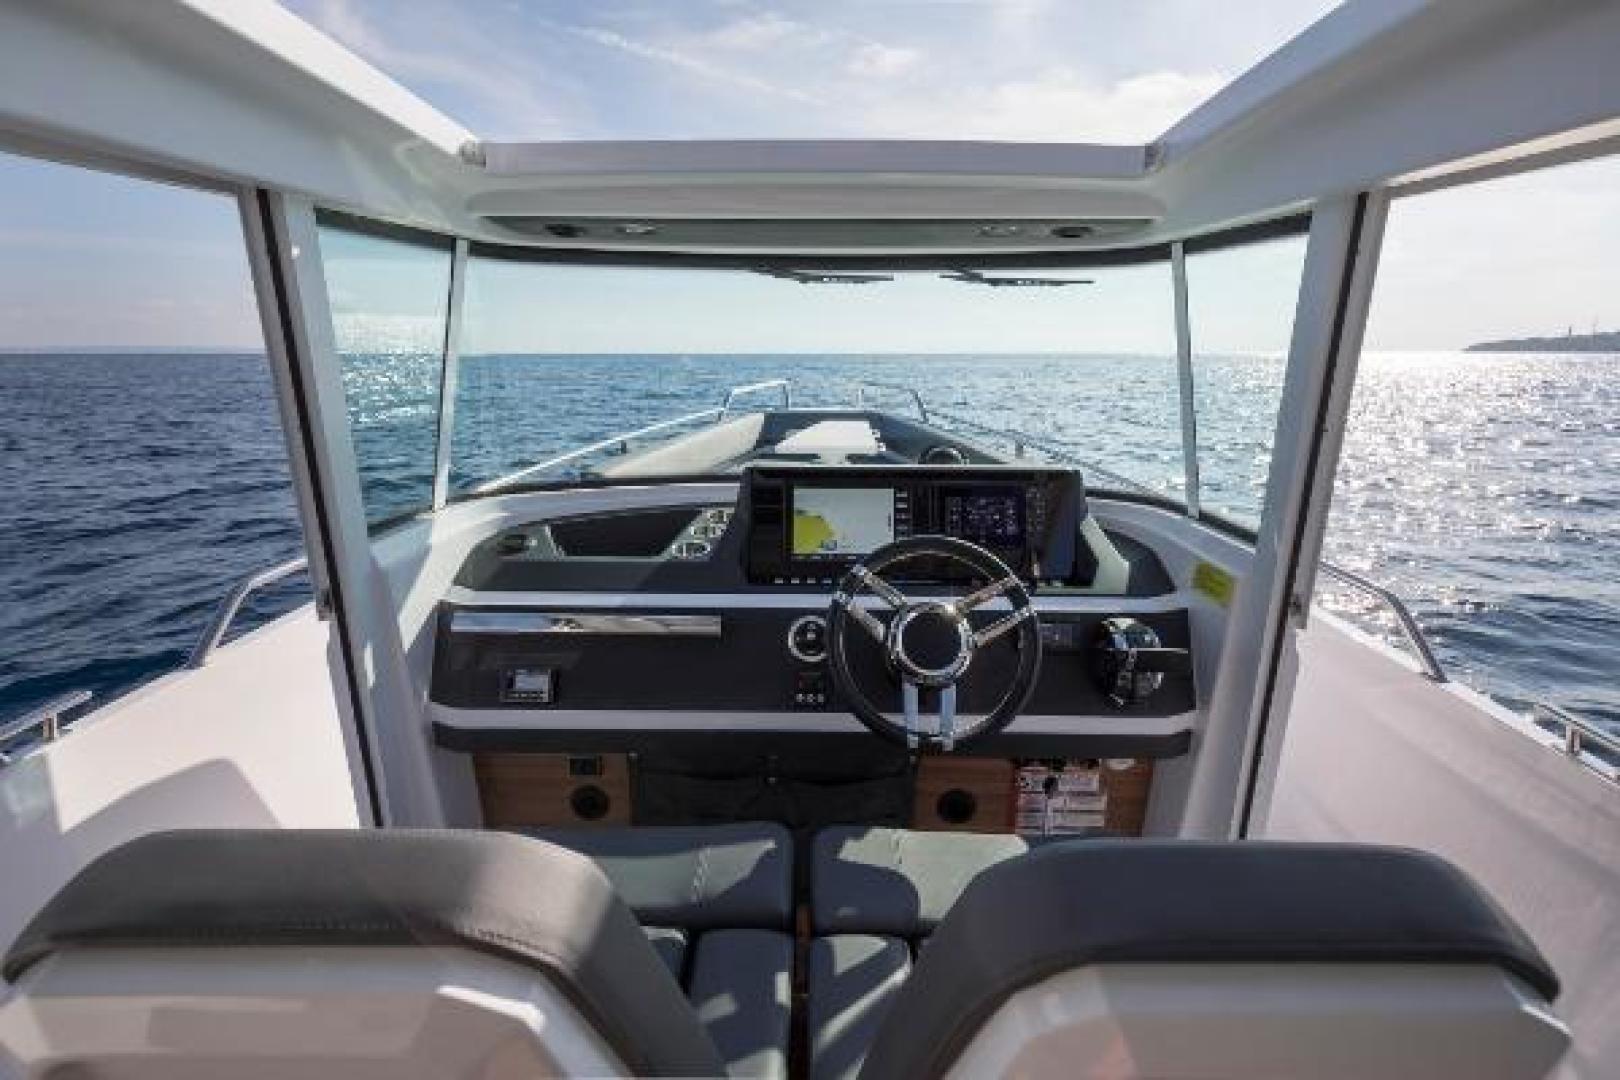 Axopar-28 CABIN 2020-Axopar 28 CABIN Fort Lauderdale-Florida-United States-1531671   Thumbnail